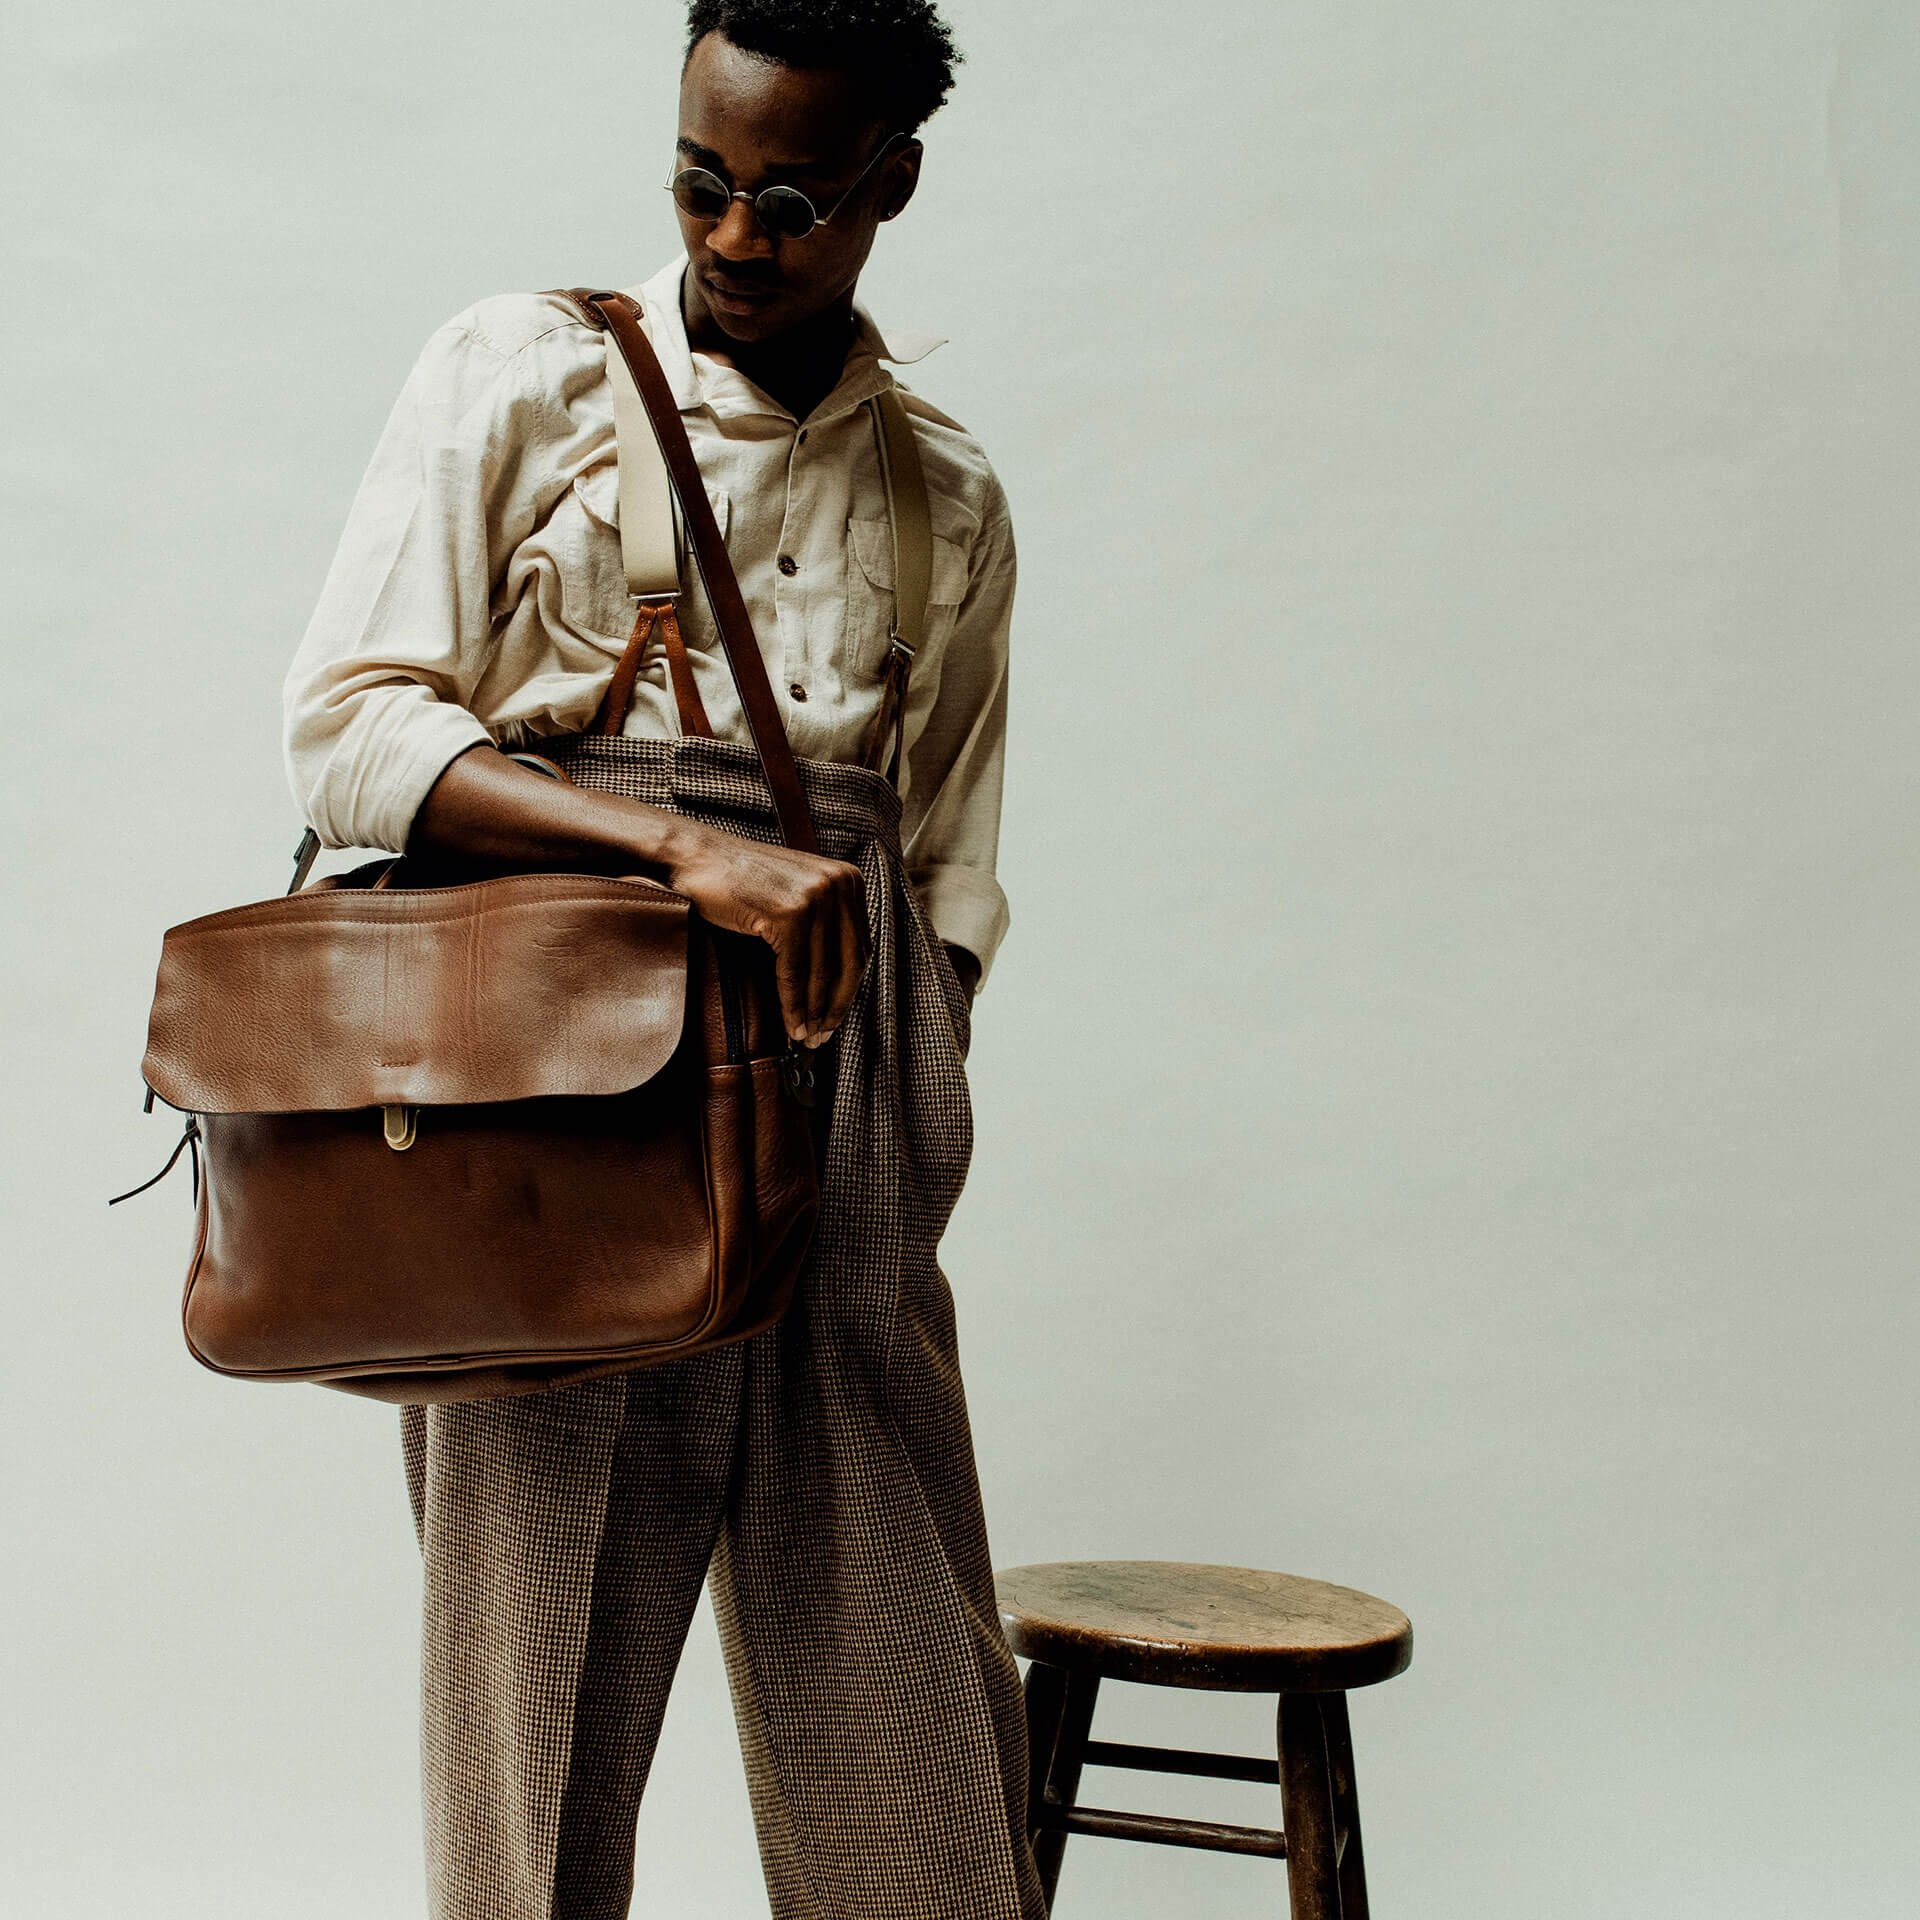 Zeppo Business bag - Cuba Libre / E Pure (image n°8)